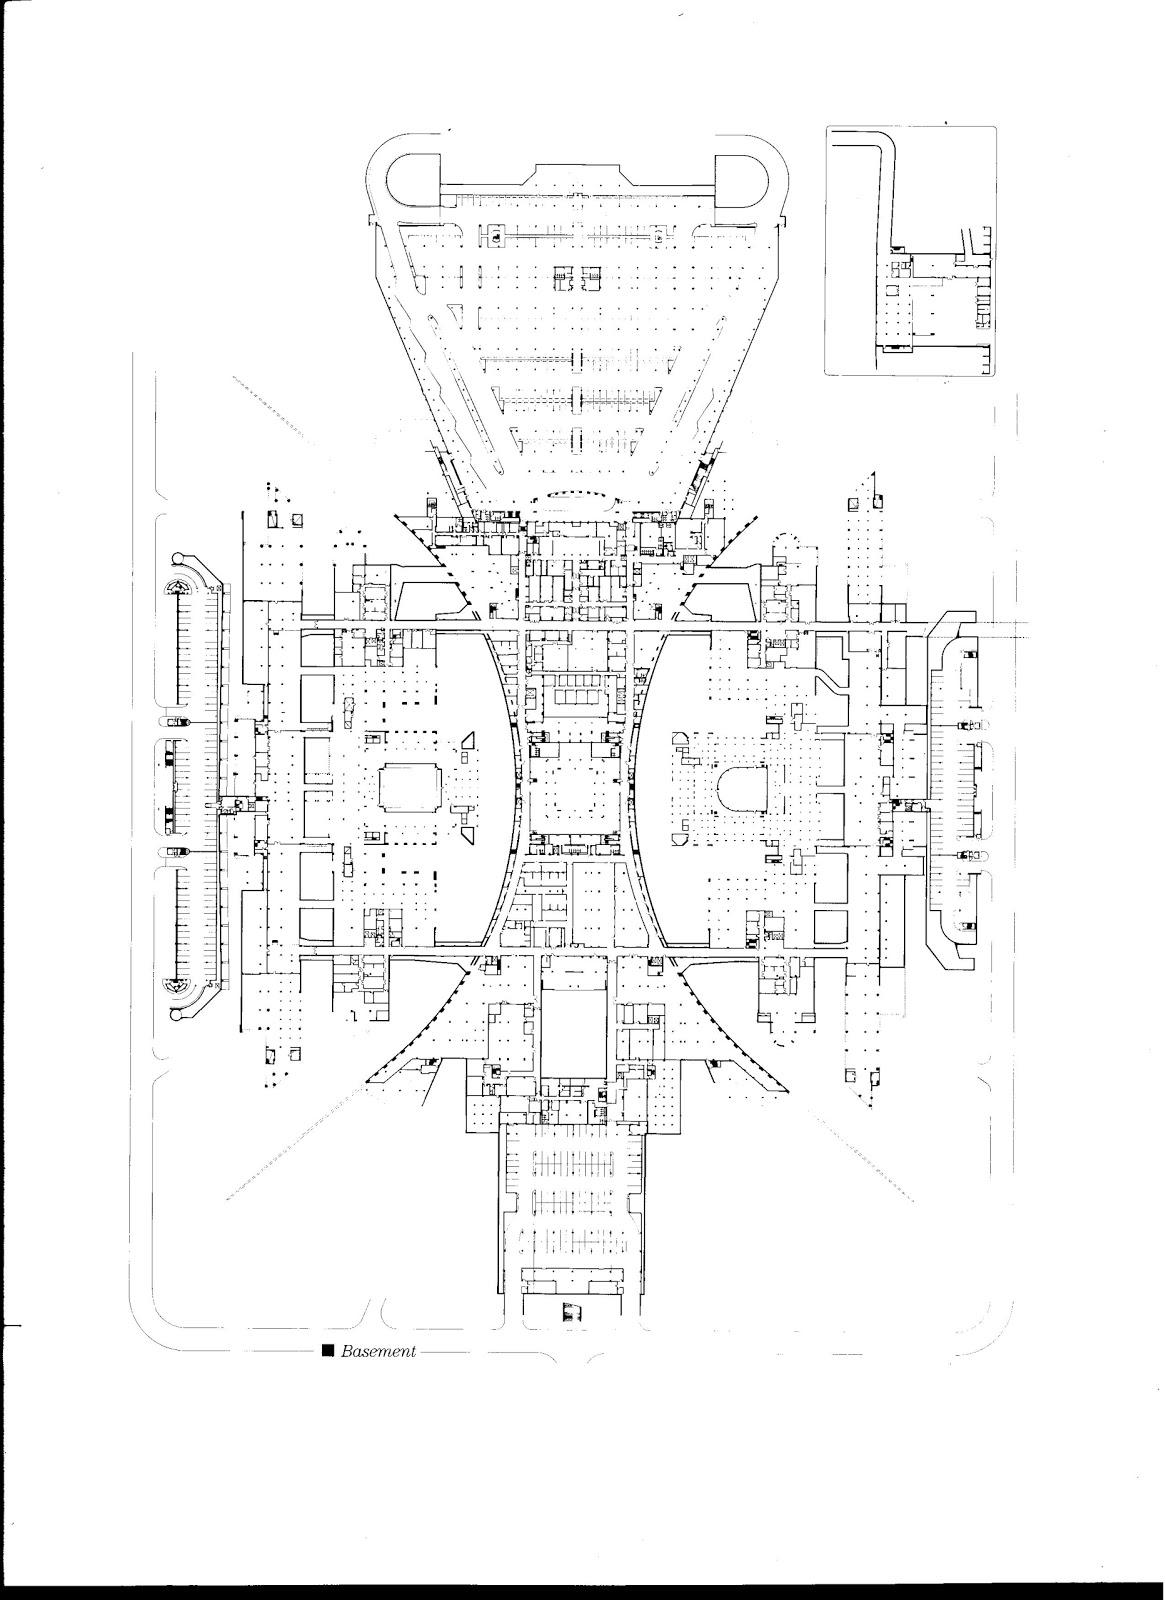 Matthew Szymula Dab810 Canberra Plans And Elevations